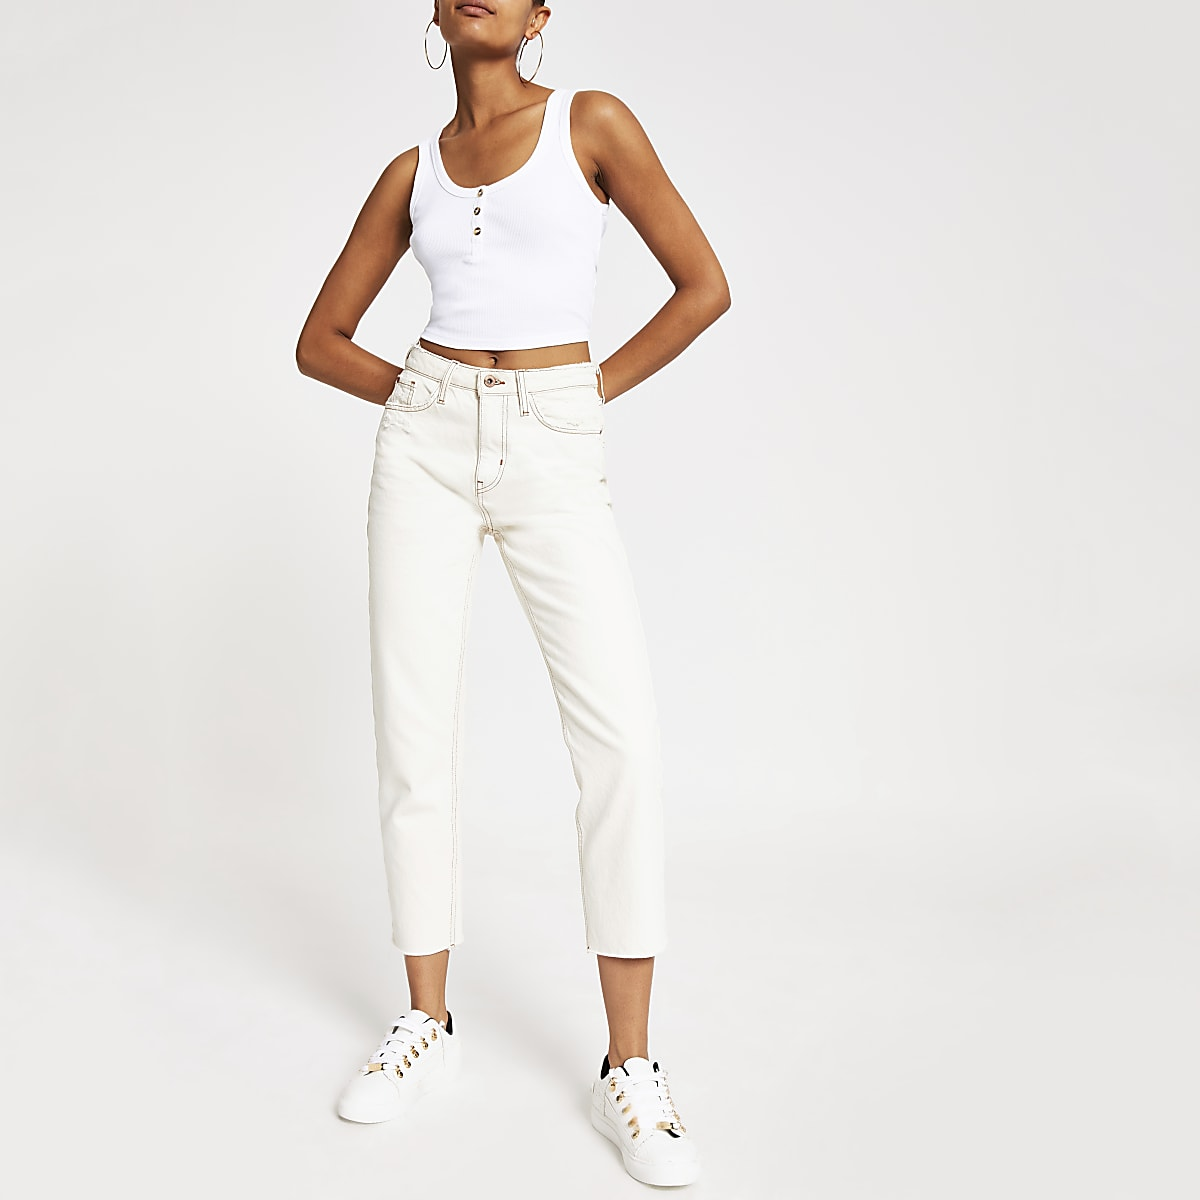 White button front crop cami vest